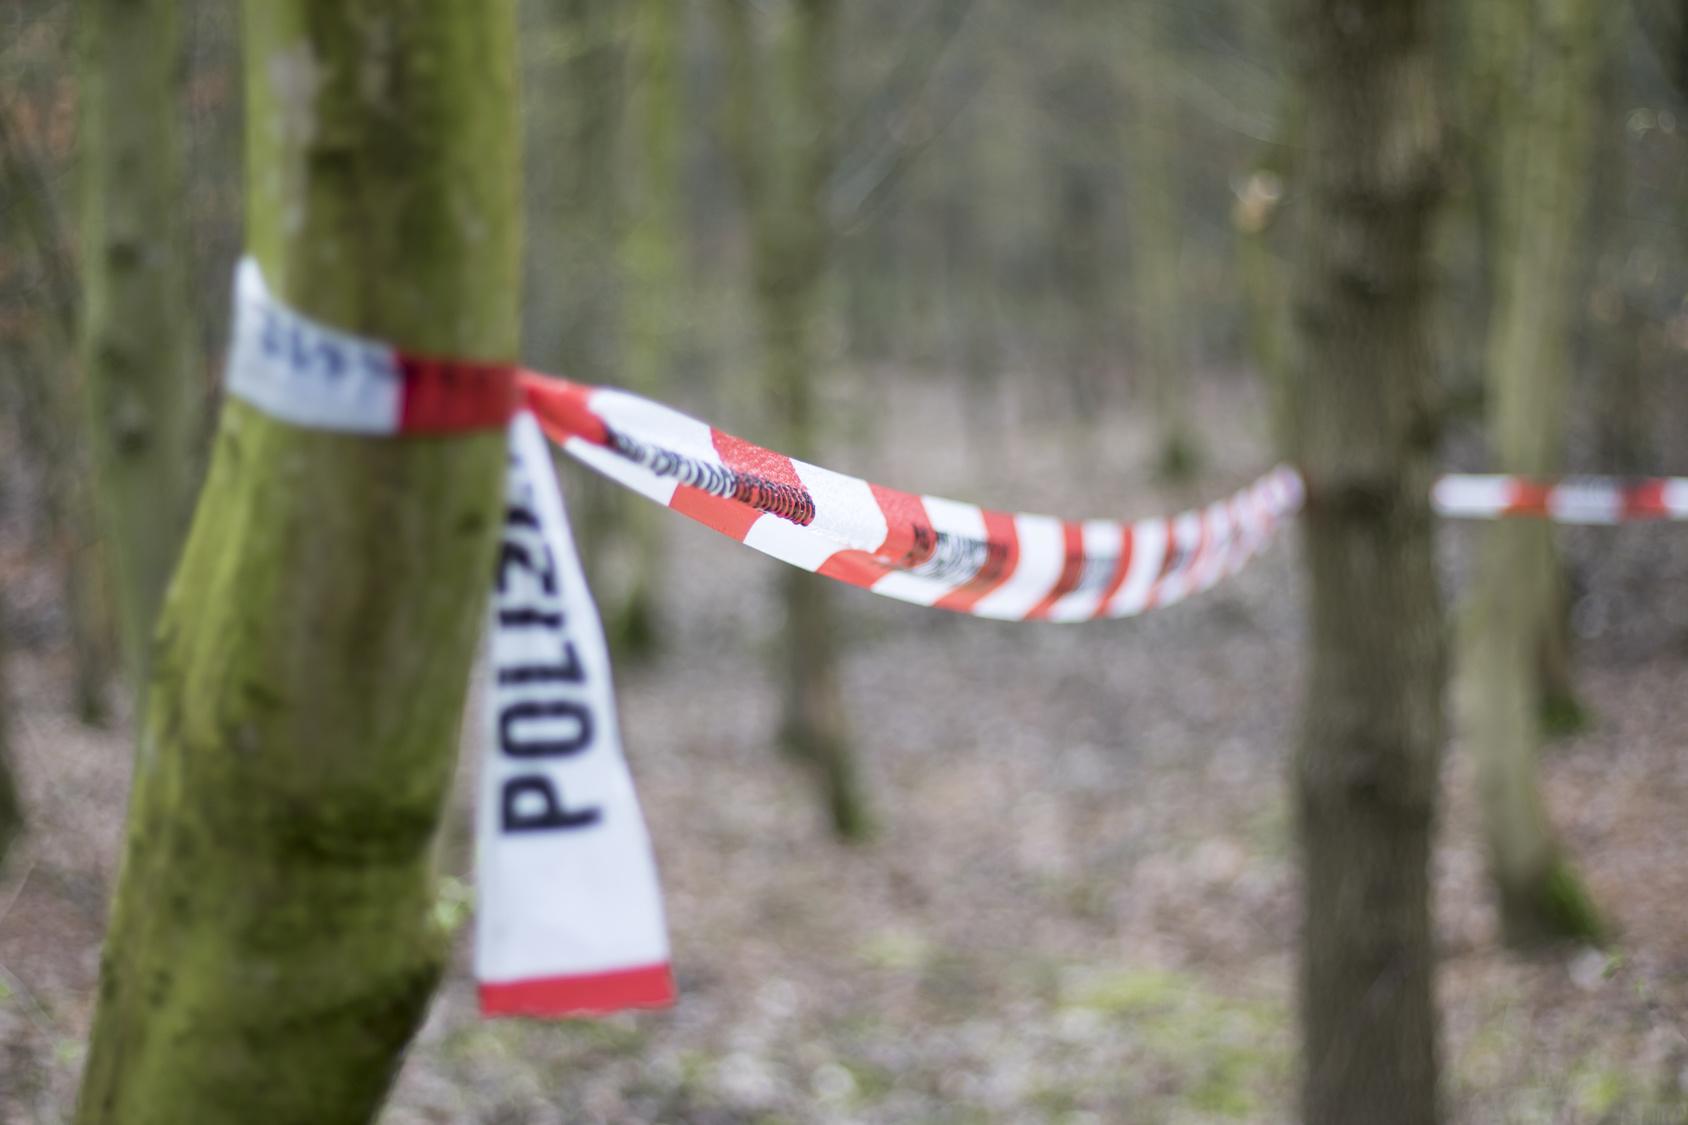 Frau stirbt bei Geburt im Wald Fall gibt Rätsel auf